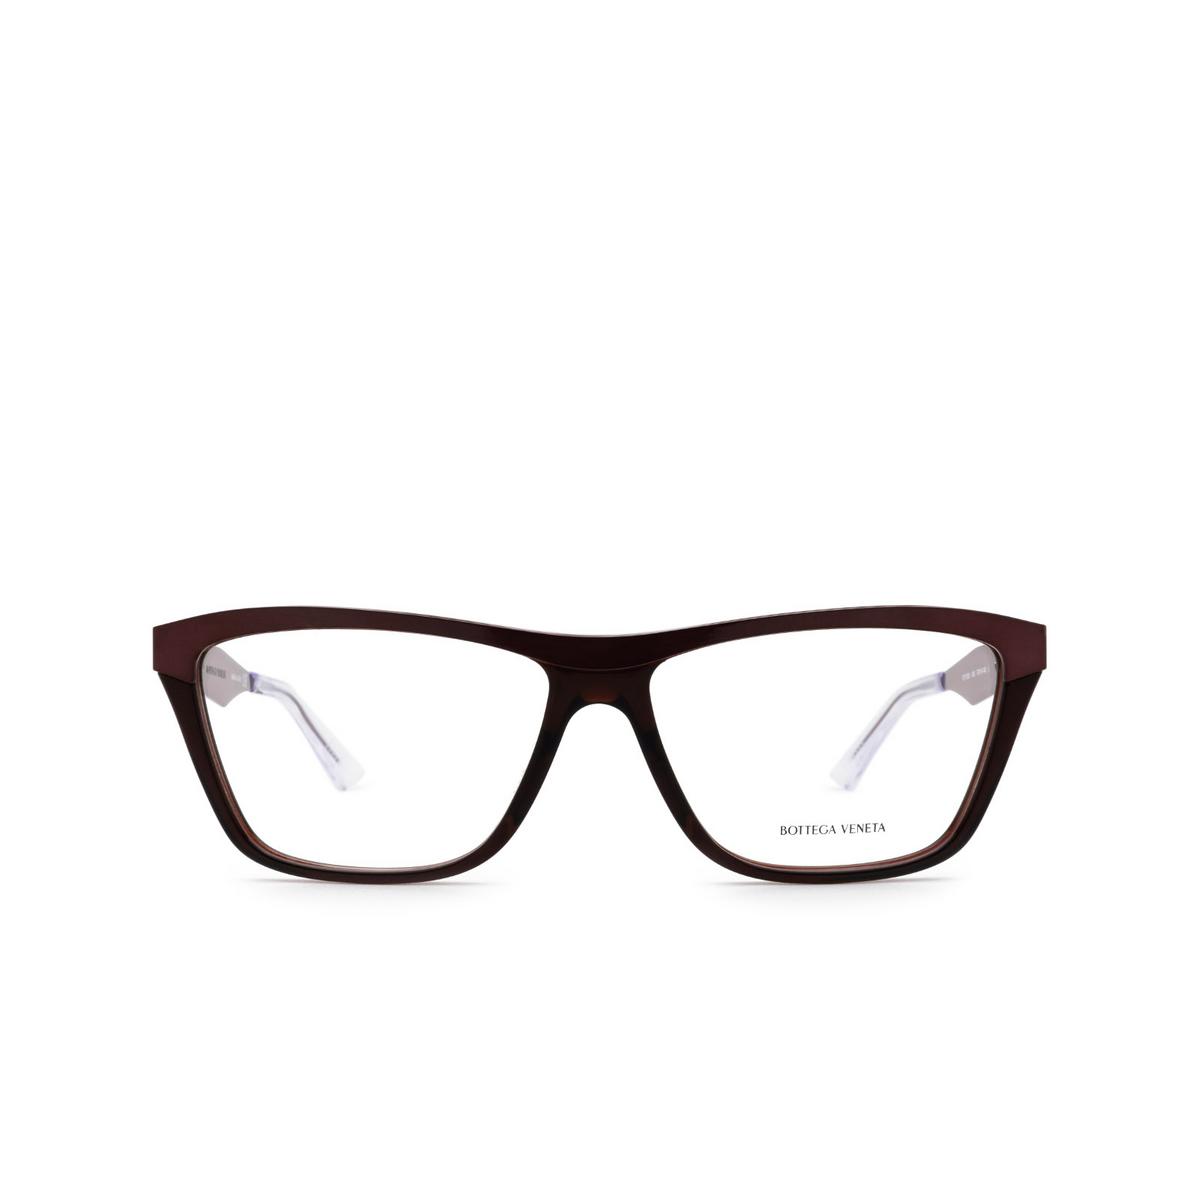 Bottega Veneta® Rectangle Eyeglasses: BV1133O color Burgundy 003 - front view.